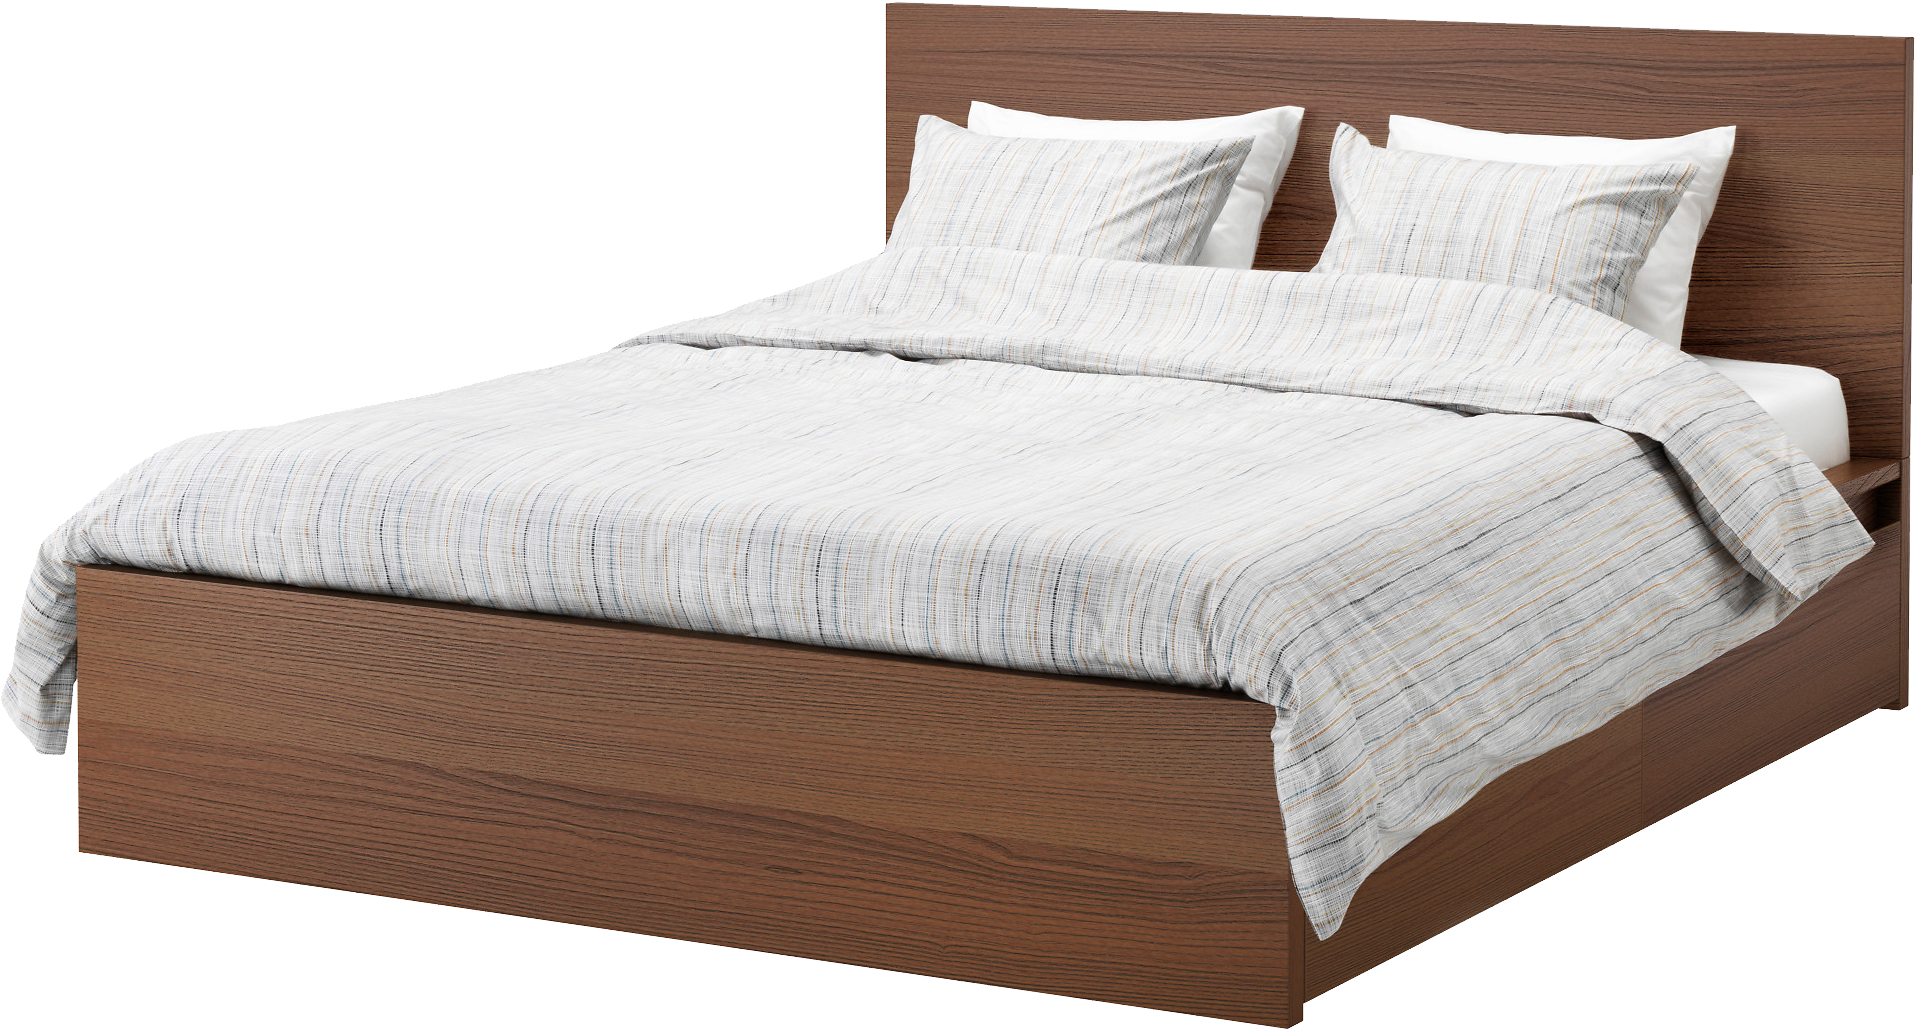 Bed Png Image Queen Size Bed Frames High Bed Frame Bed